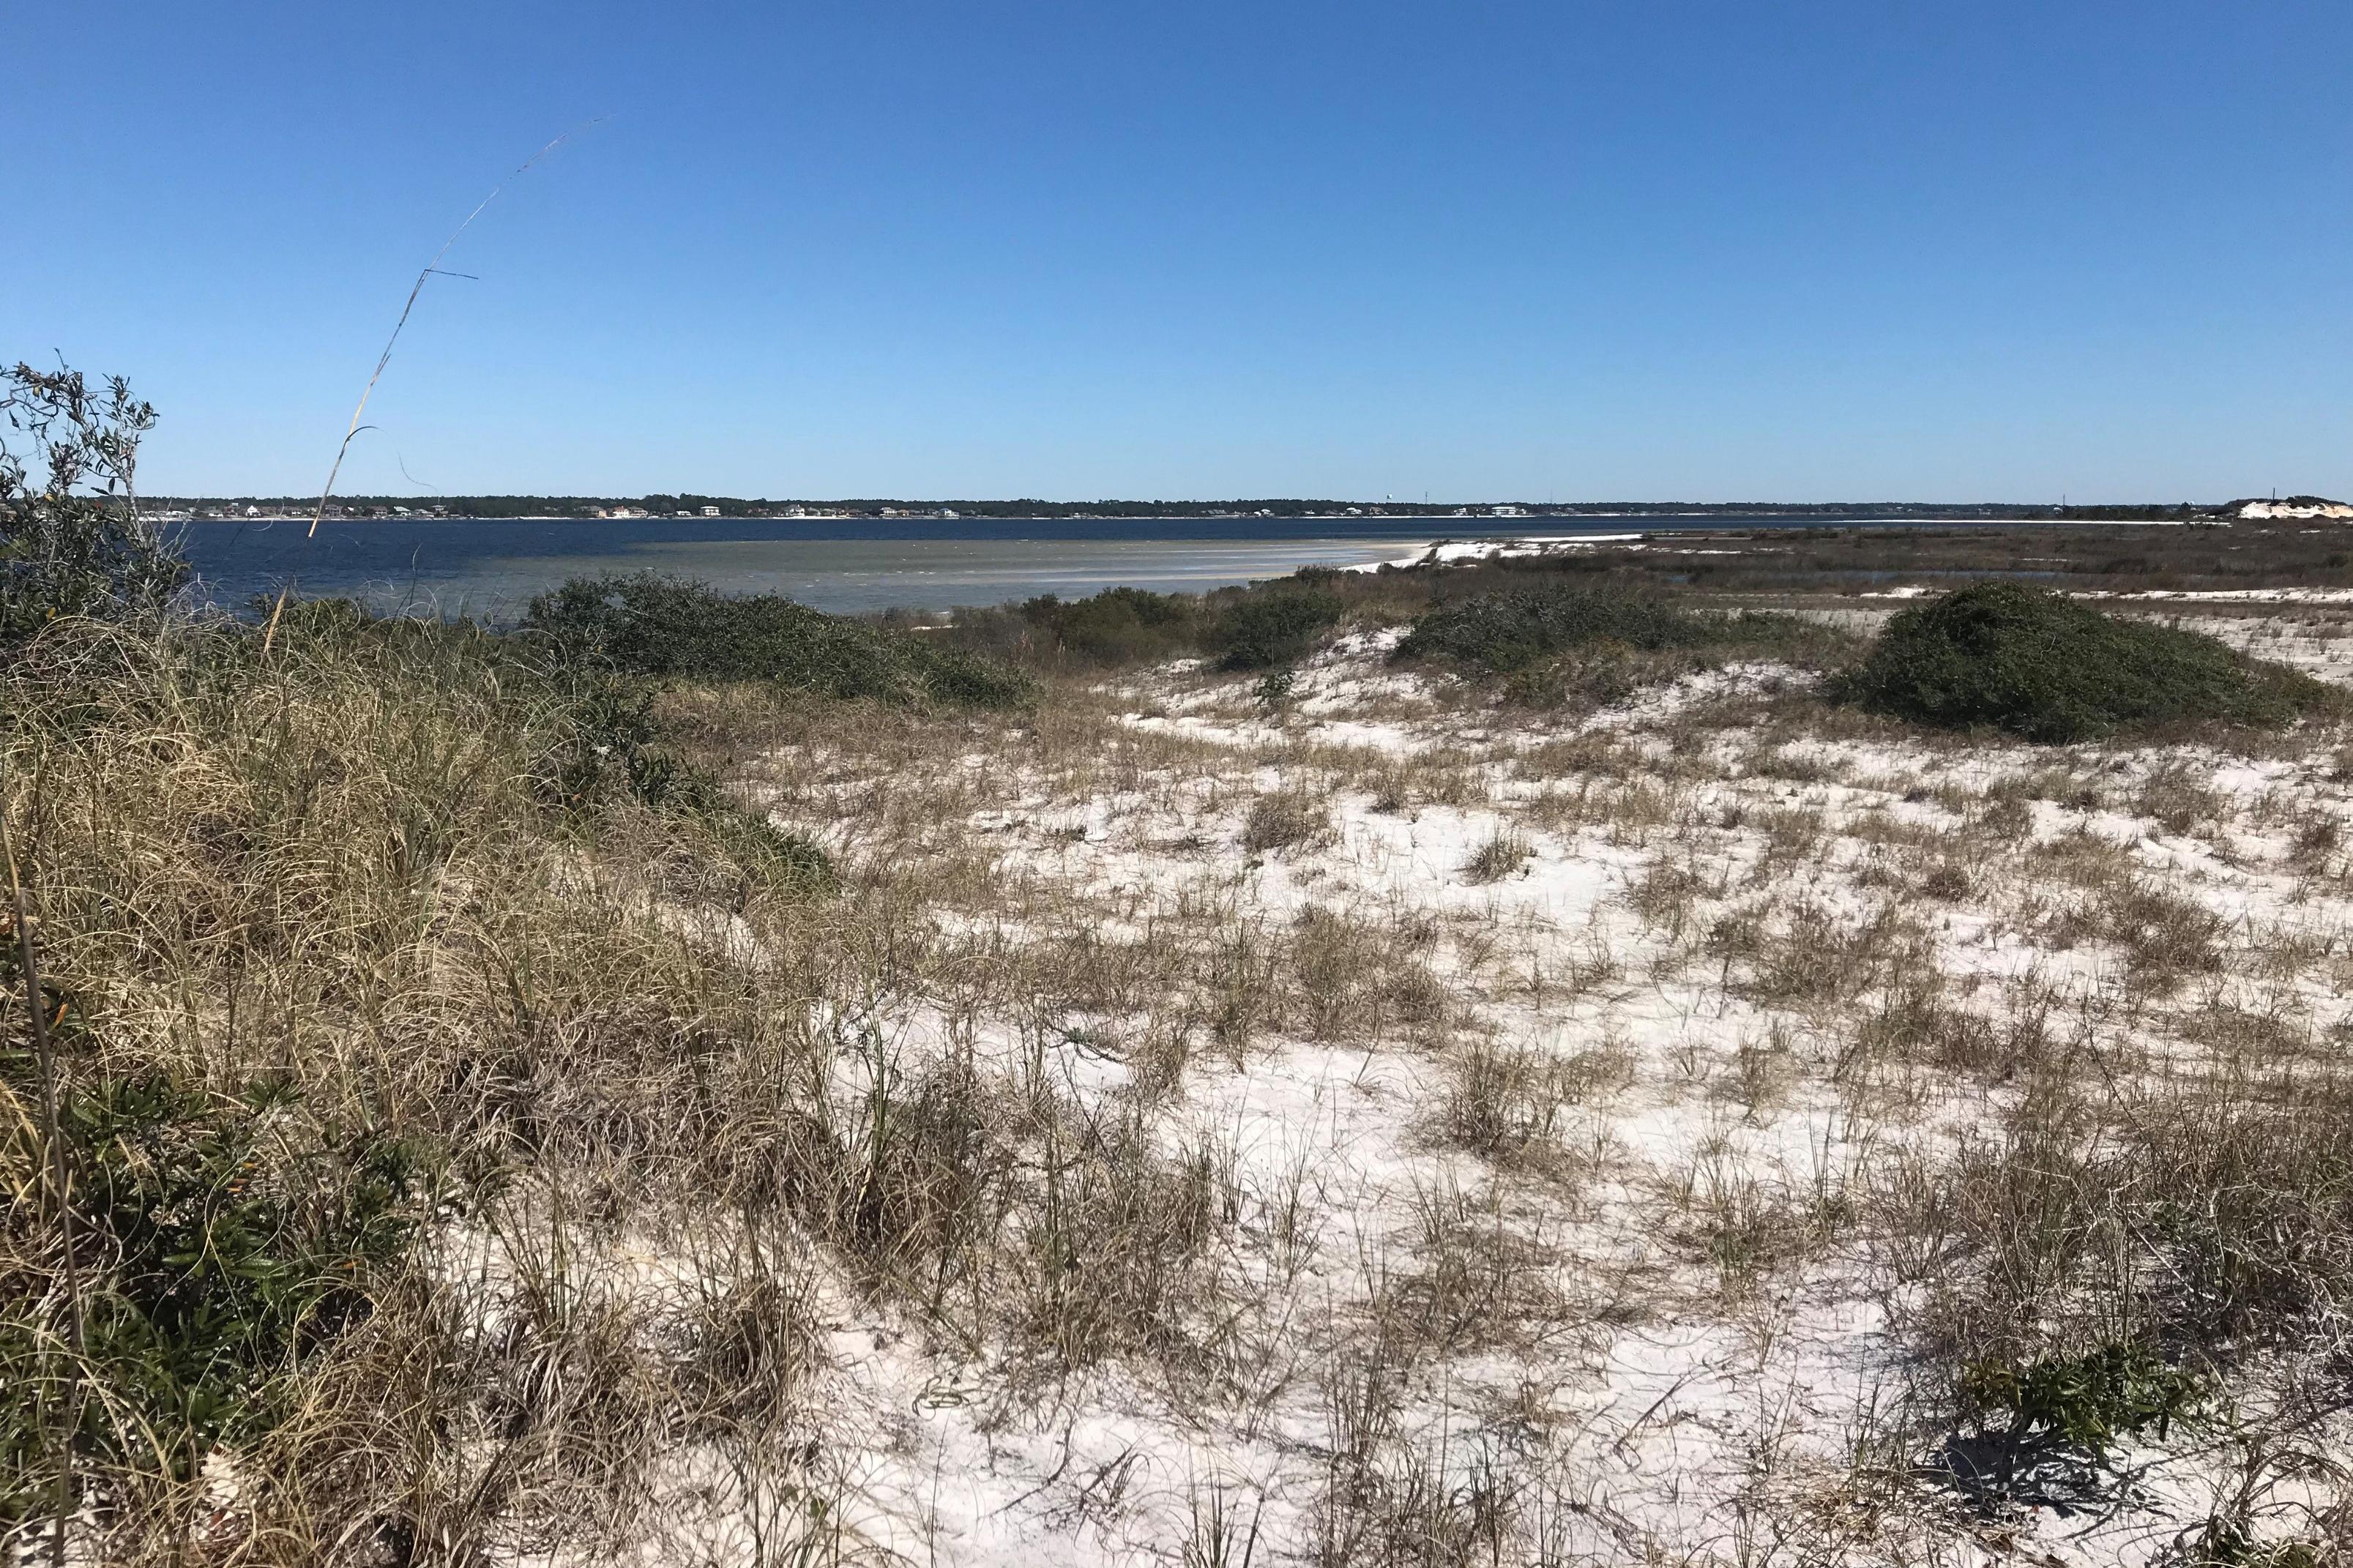 Sandy dunes and dune vegetation on Florida's coast - at Navarre Marine Park